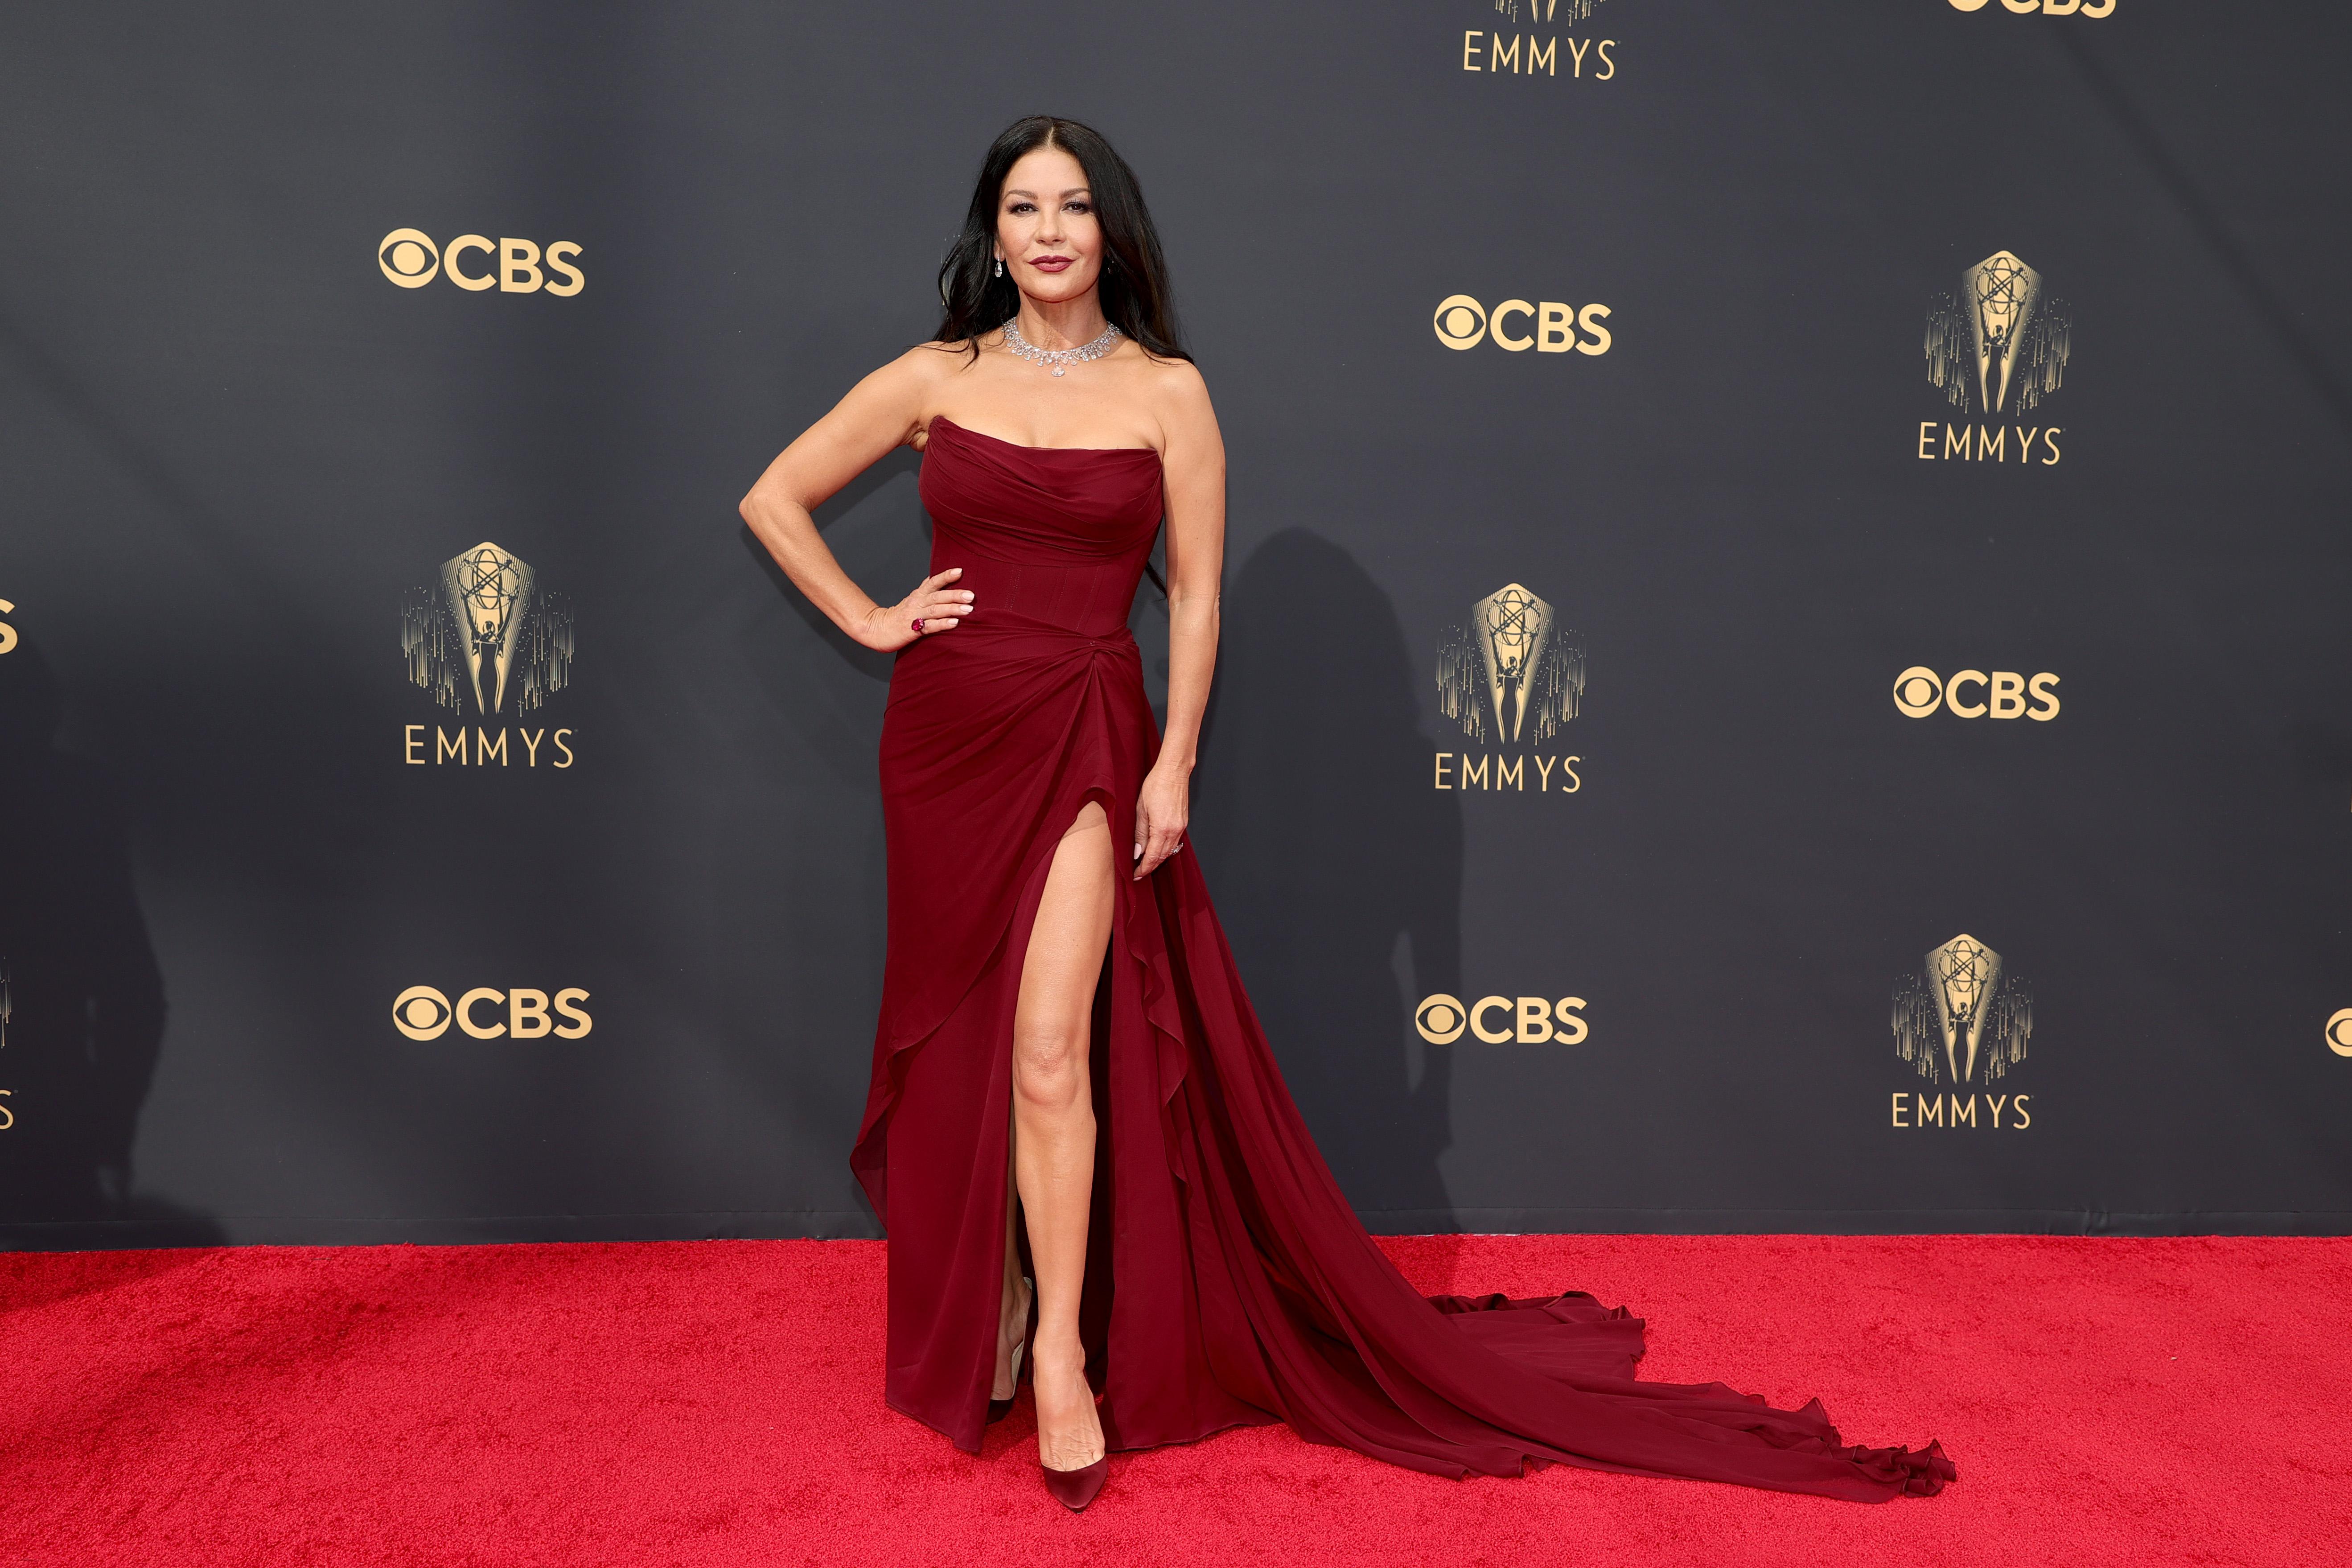 Catherine Zeta-Jones at an event for The 73rd Primetime Emmy Awards (2021)